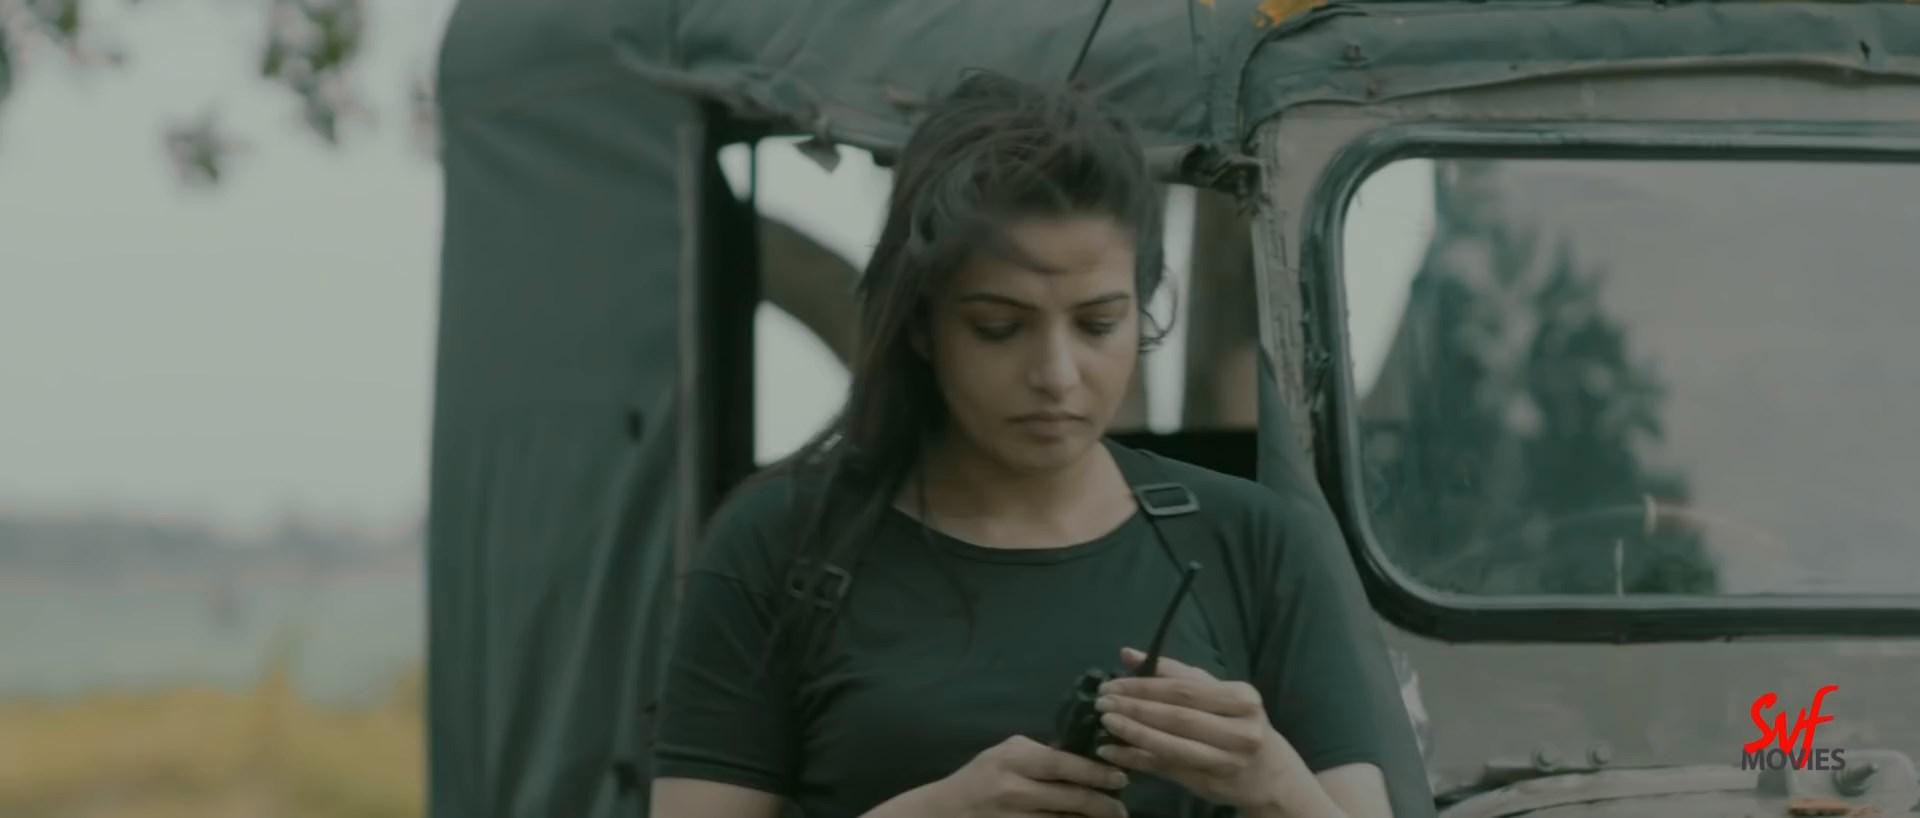 Zombiesthaan 2021 Full Bengali Film.mp4 snapshot 00.08.02.333